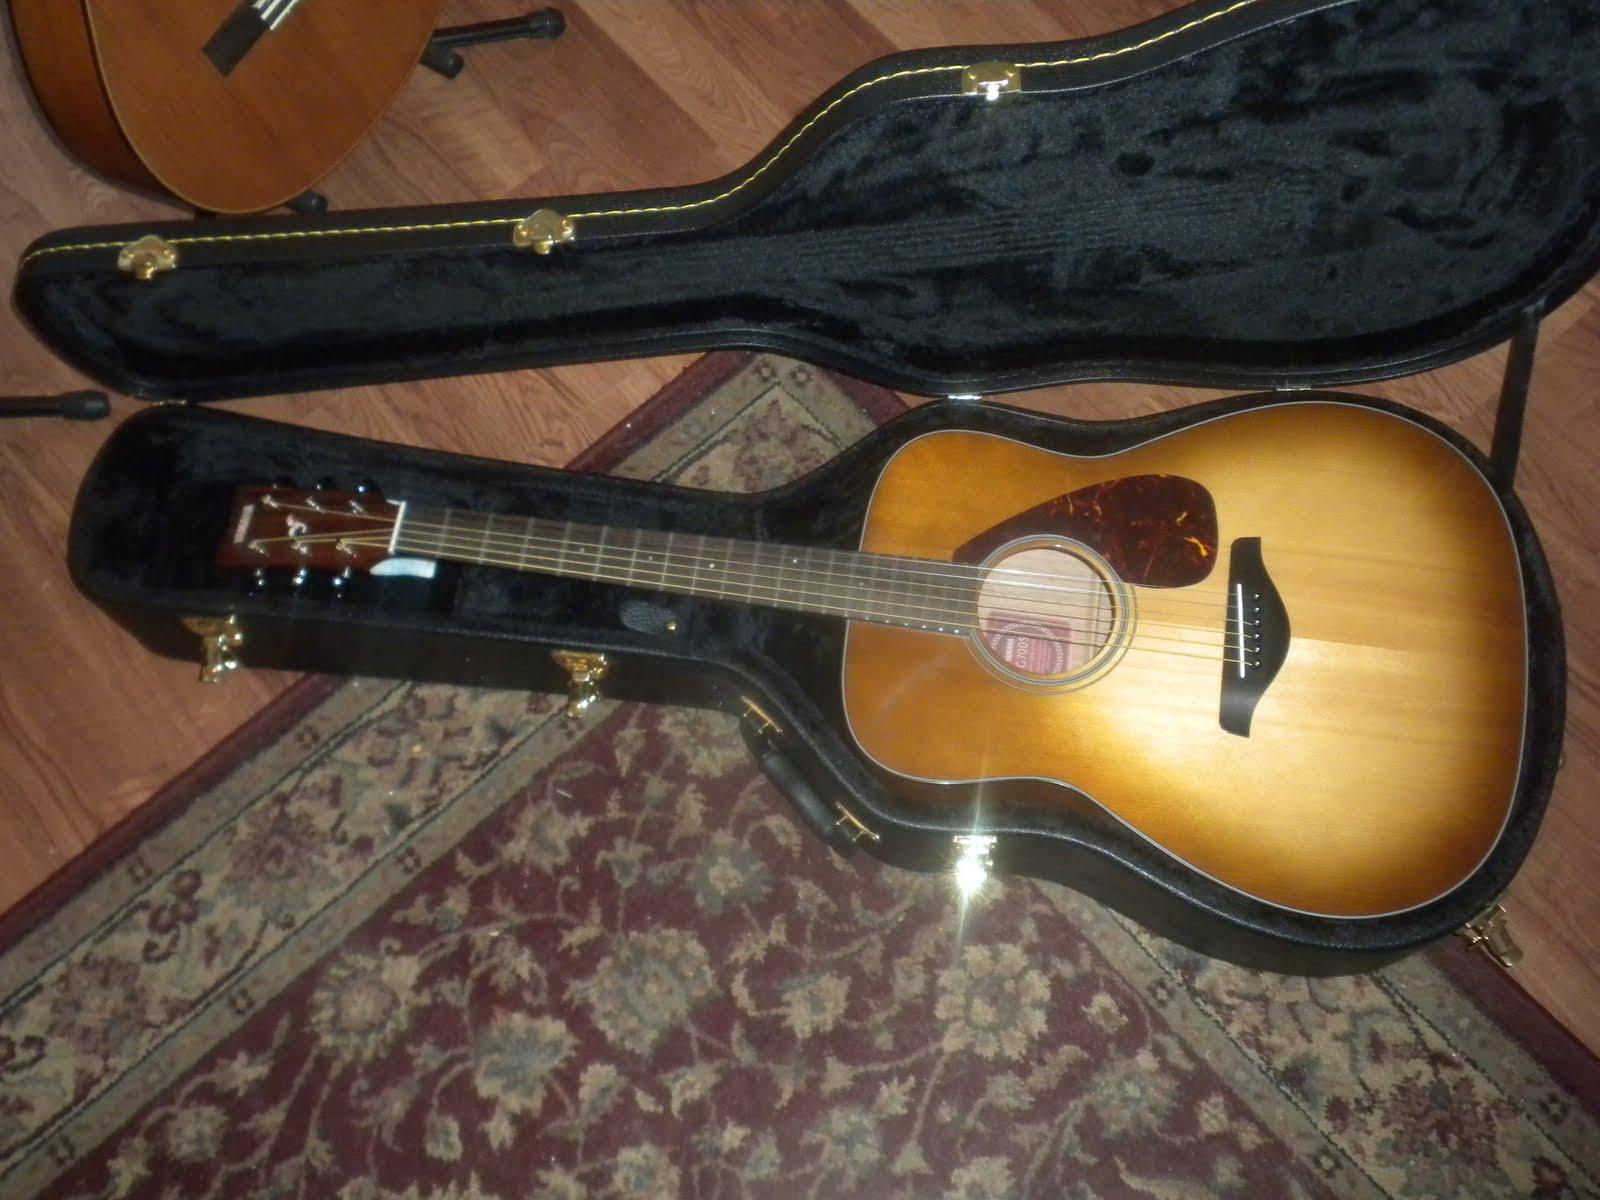 Ngd yamaha fg700s sandburst the acoustic guitar forum for Yamaha fg700s dimensions